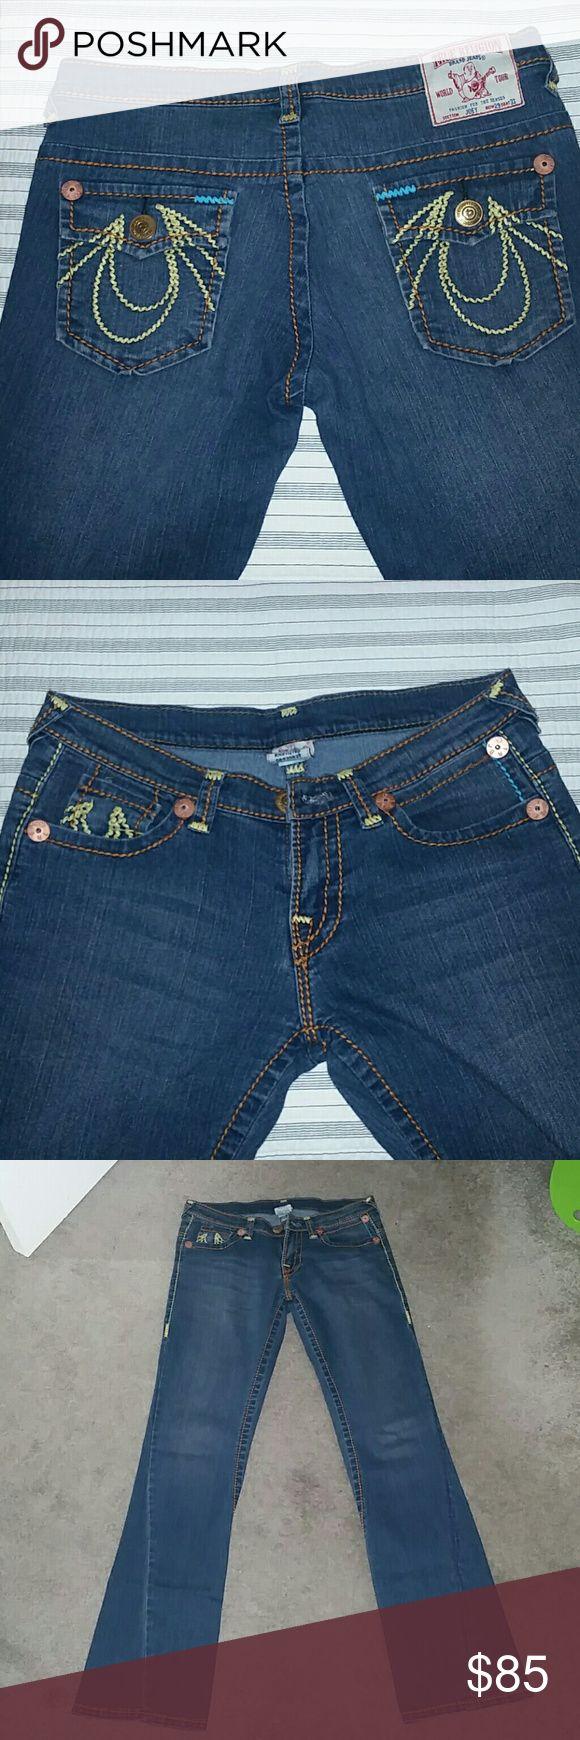 True religion women jeans True Religion Joey jeans size 29 length 33.. in great condition.. True Religion Pants Boot Cut & Flare